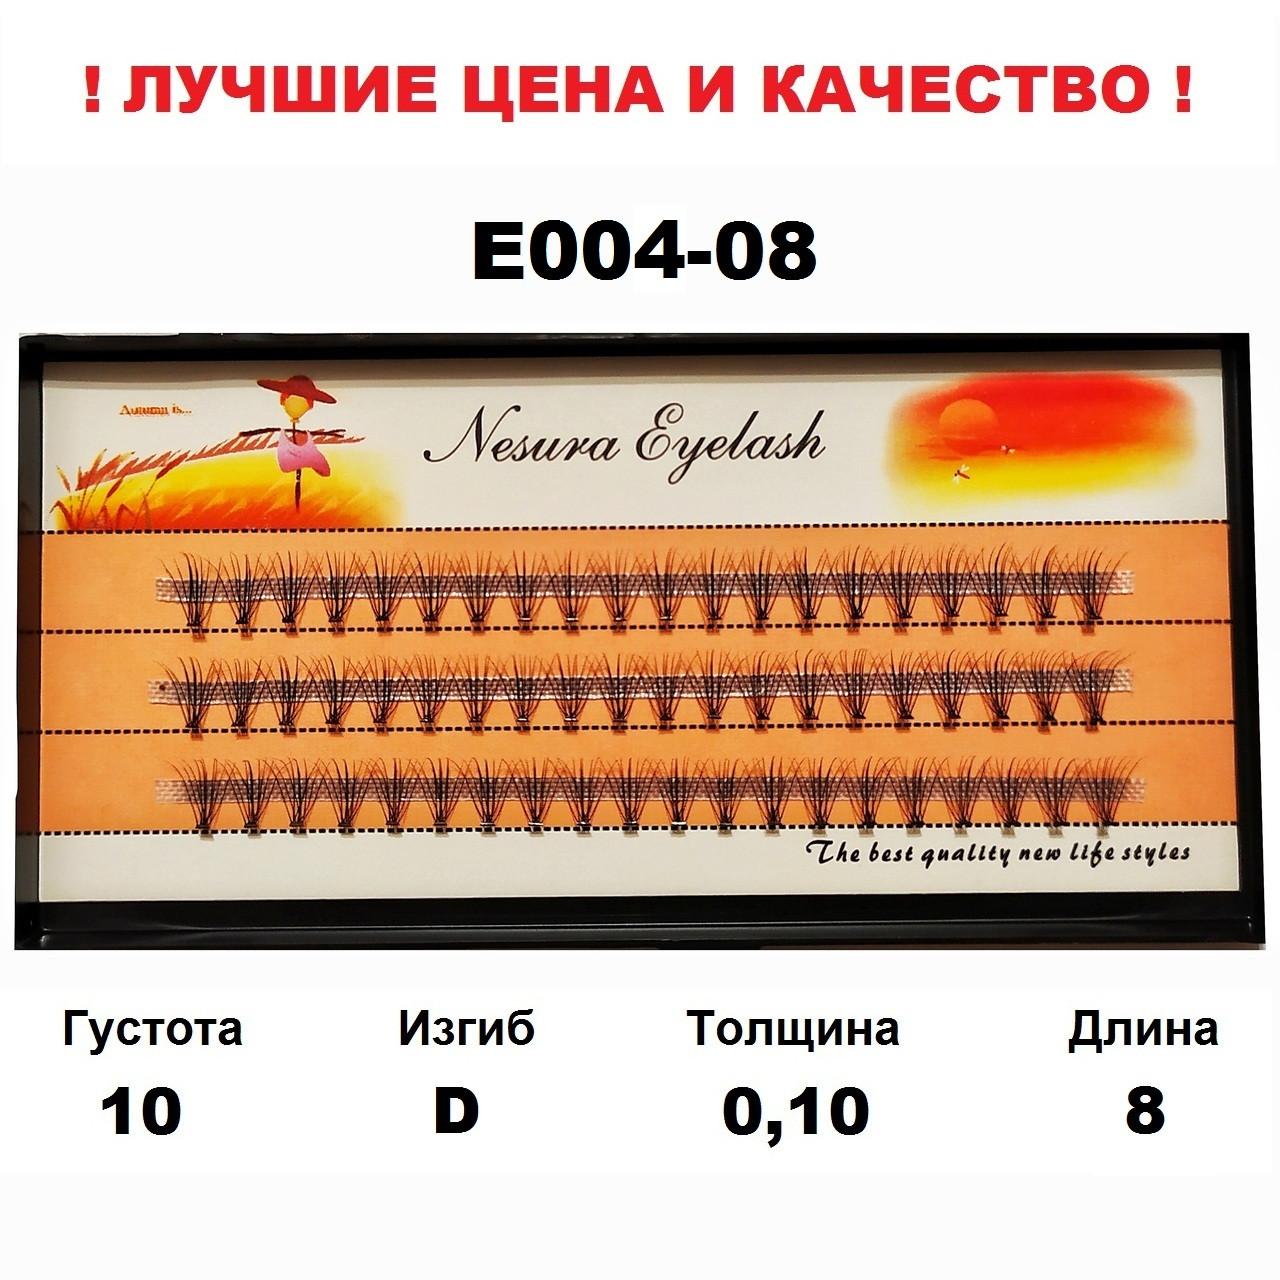 Ресницы Nesura 10D, 8-15 мм, изгиб D, 0,10, 60 пучков 8